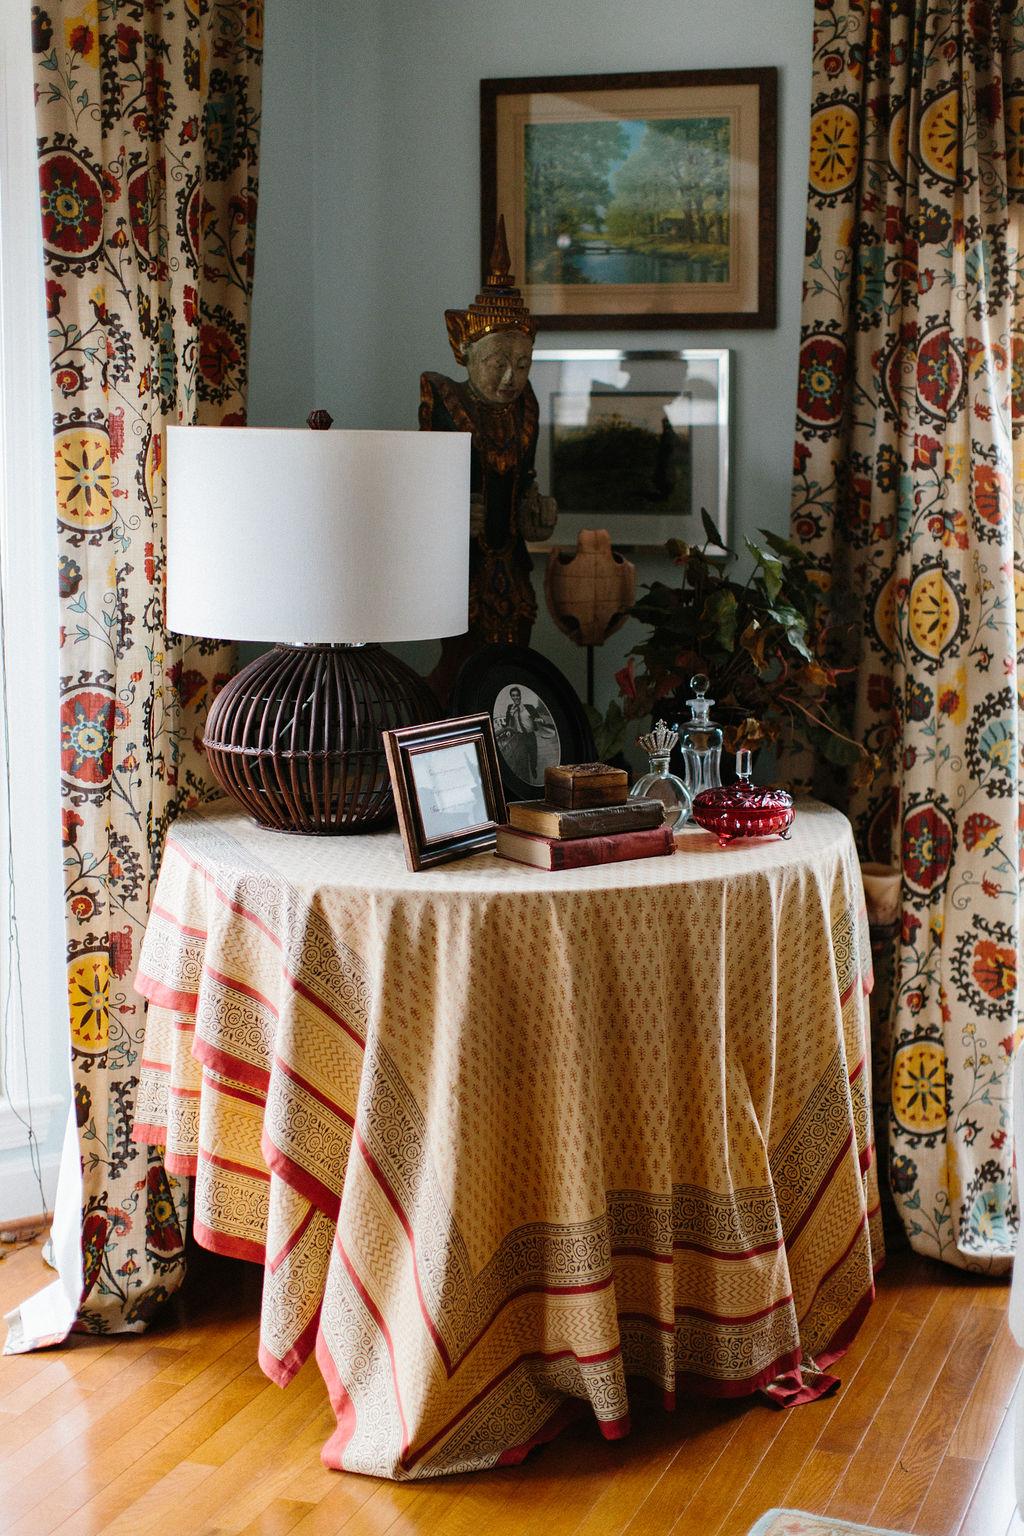 Journey-Jacobs-Design-Studio-Louisville-Residential-Commercial-Hospitality-Interior-Design-Traditional-Modern-14.JPG